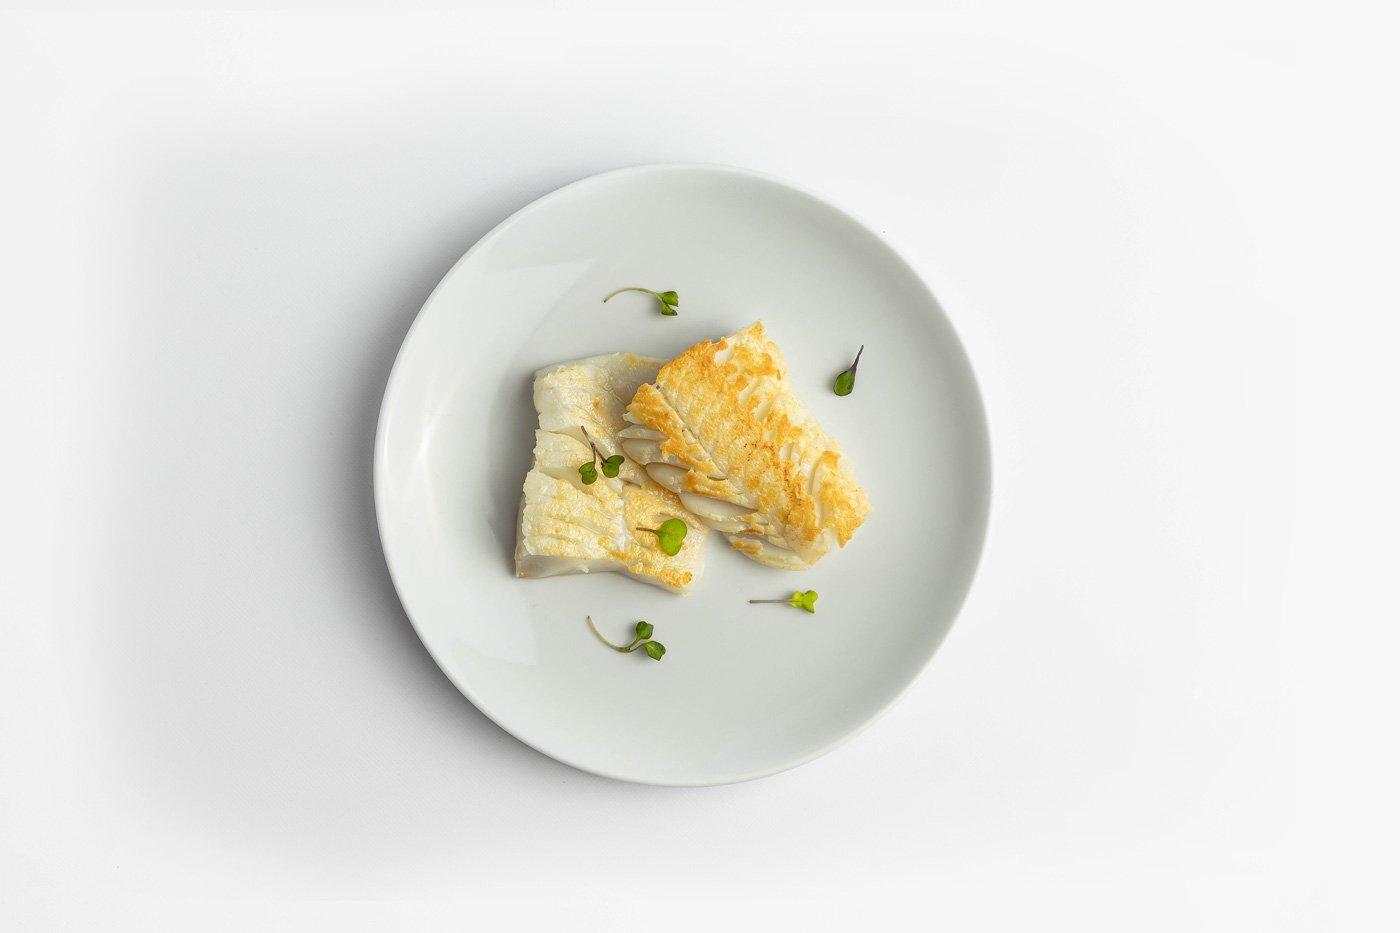 Alaskan Cod Fillet Product Image